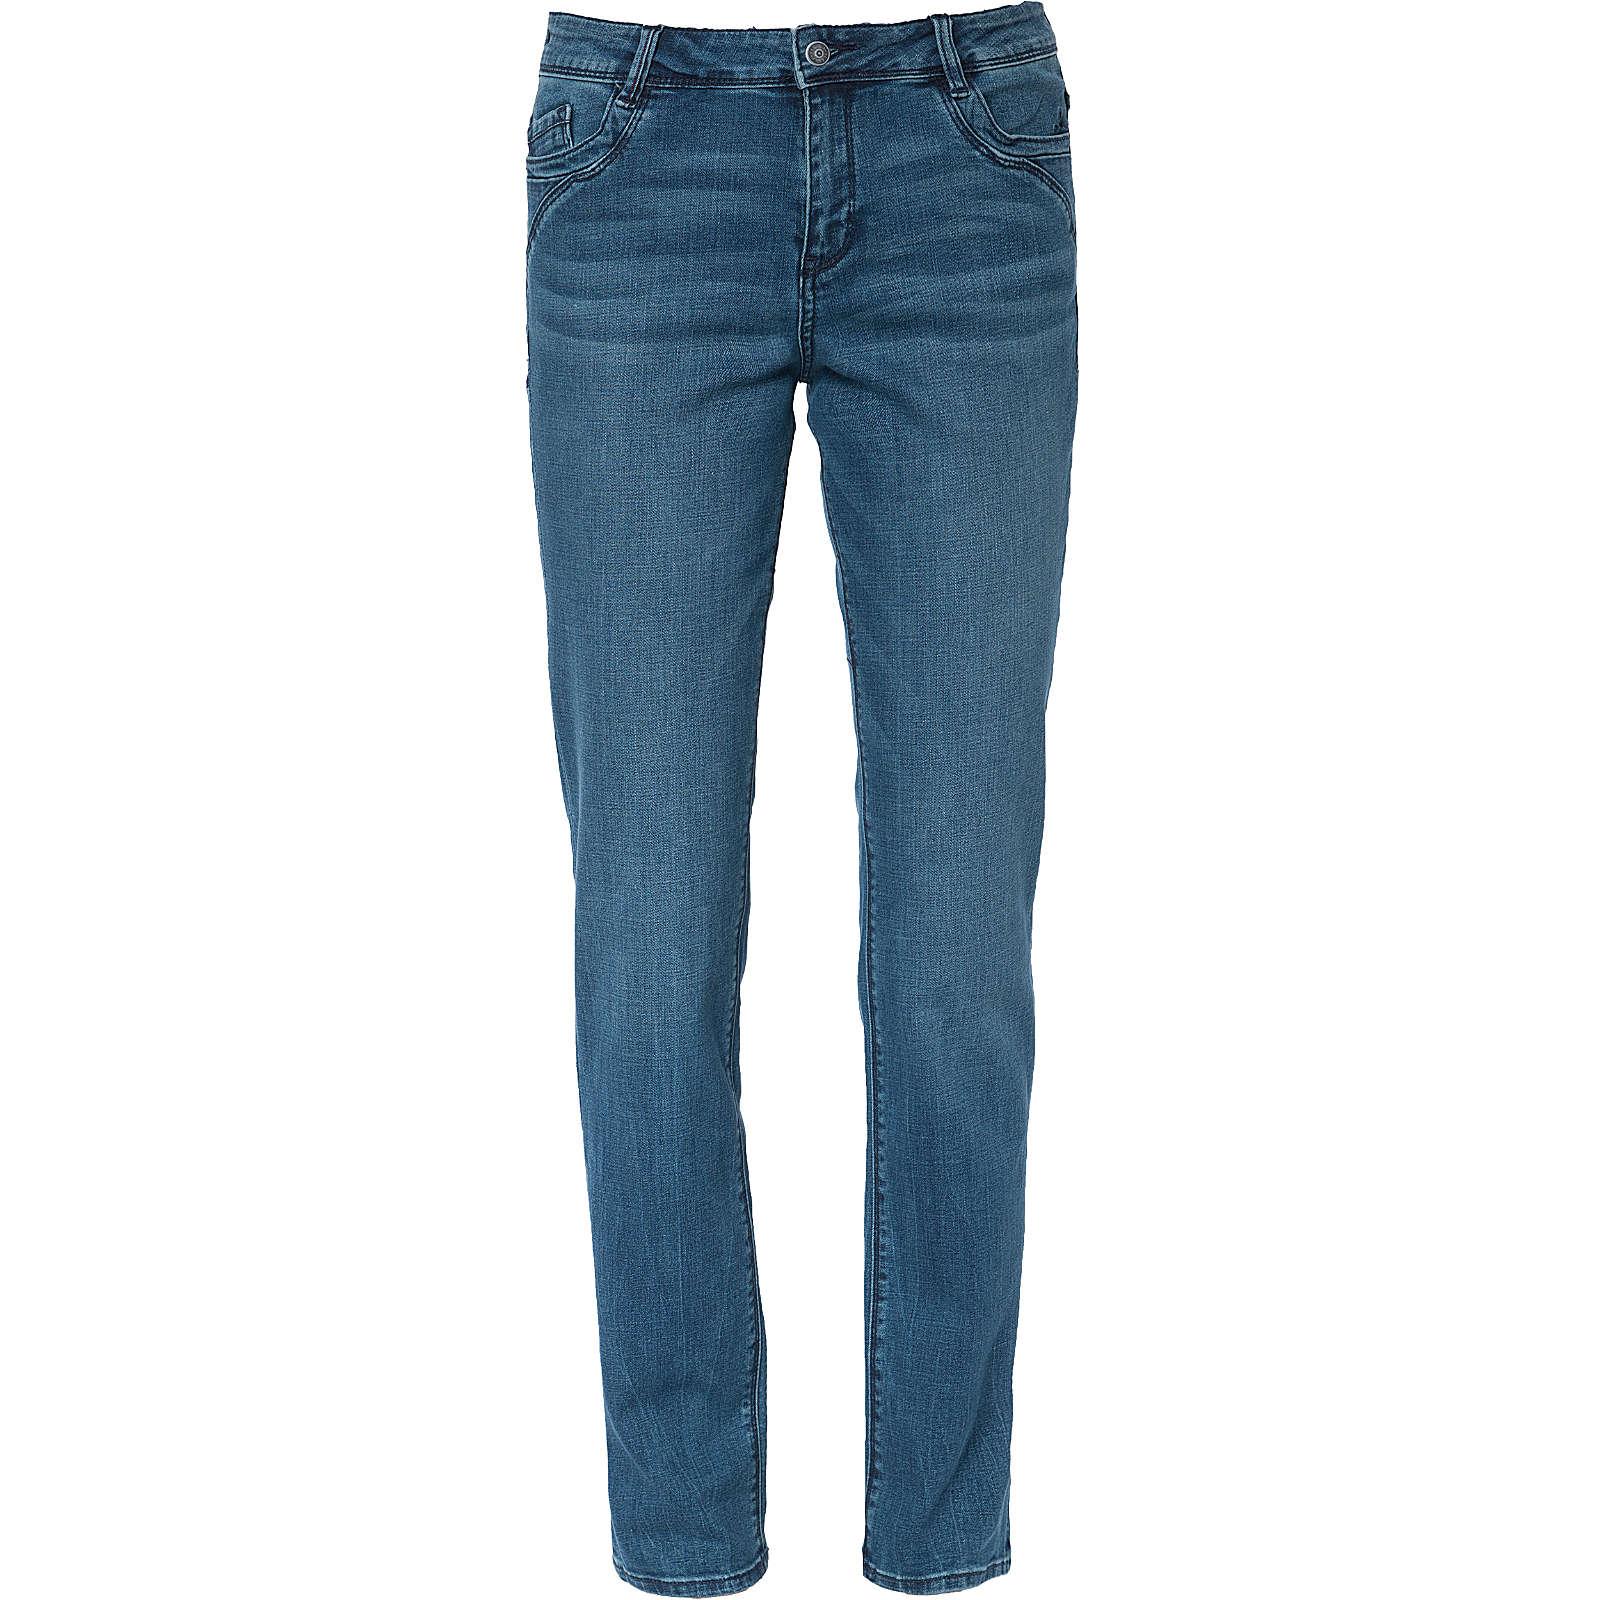 s.Oliver Jeans Straight blau Damen Gr. 34/L32